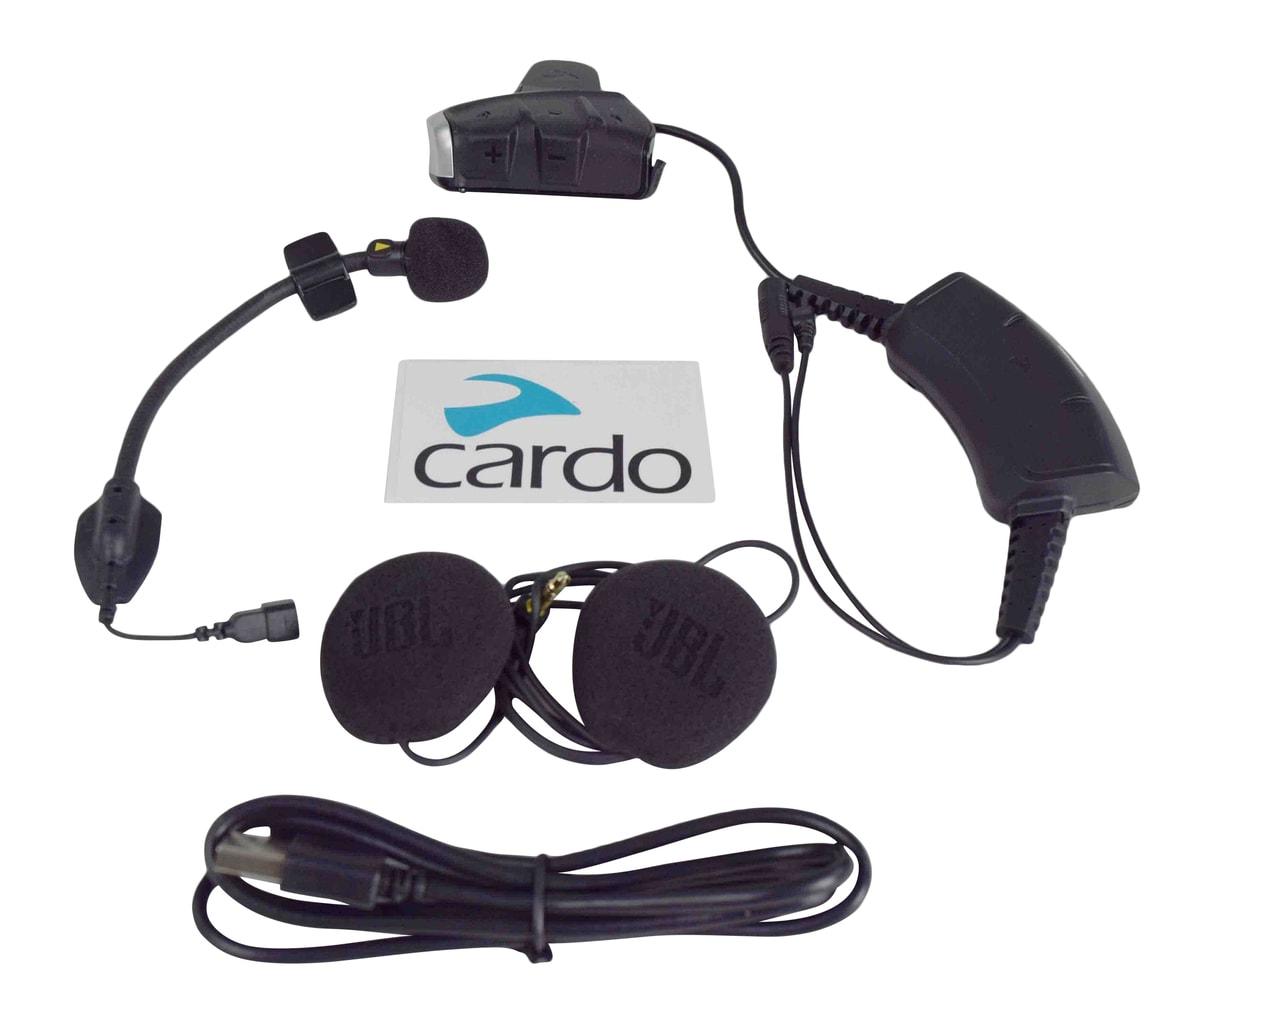 picture of Cardo PackTalk Slim